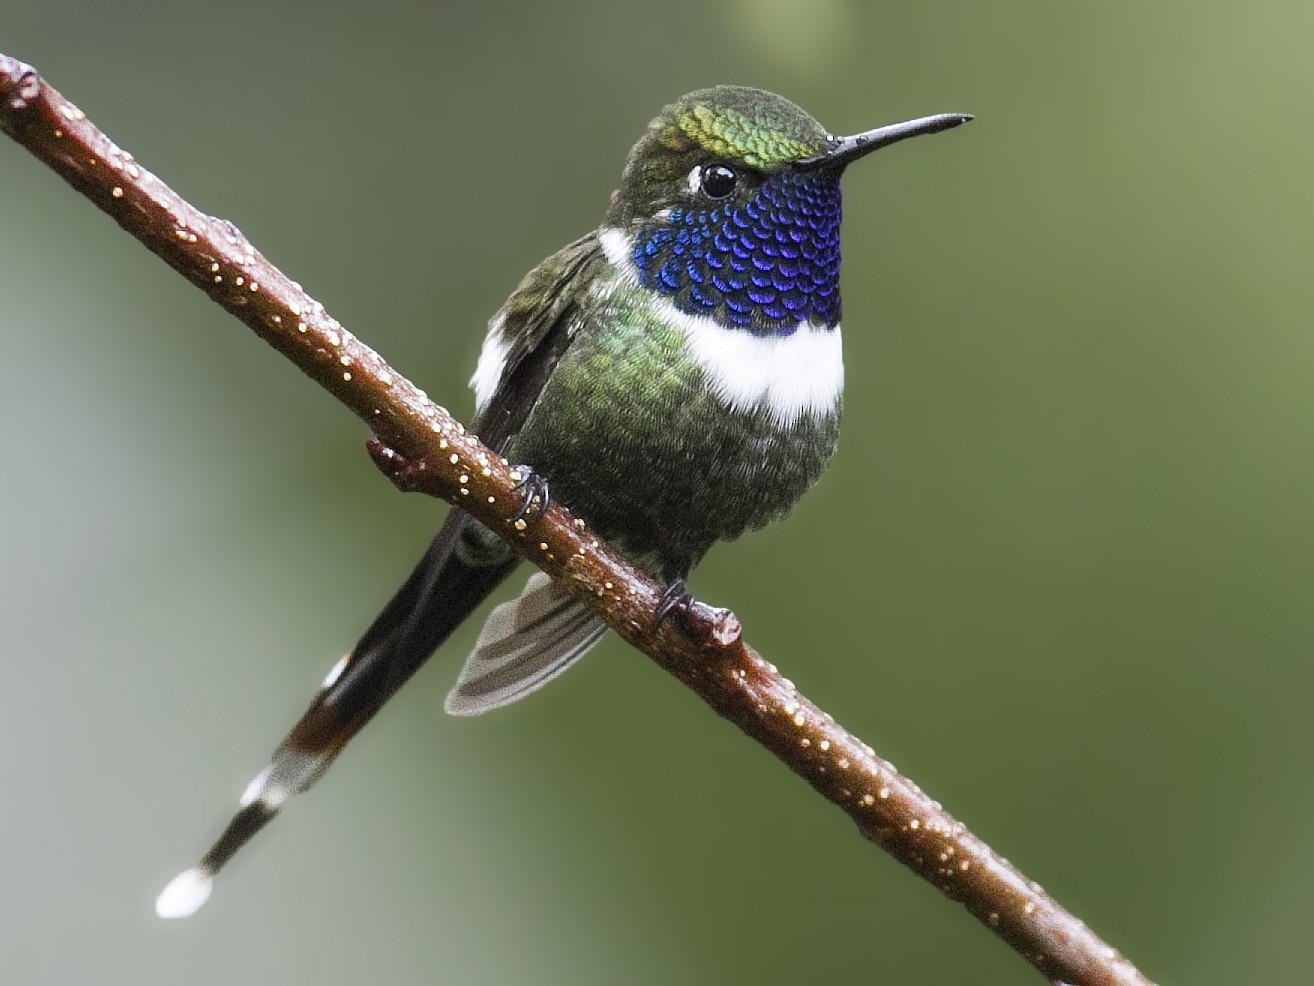 Sparkling-tailed Hummingbird - Juan Diego Vargas